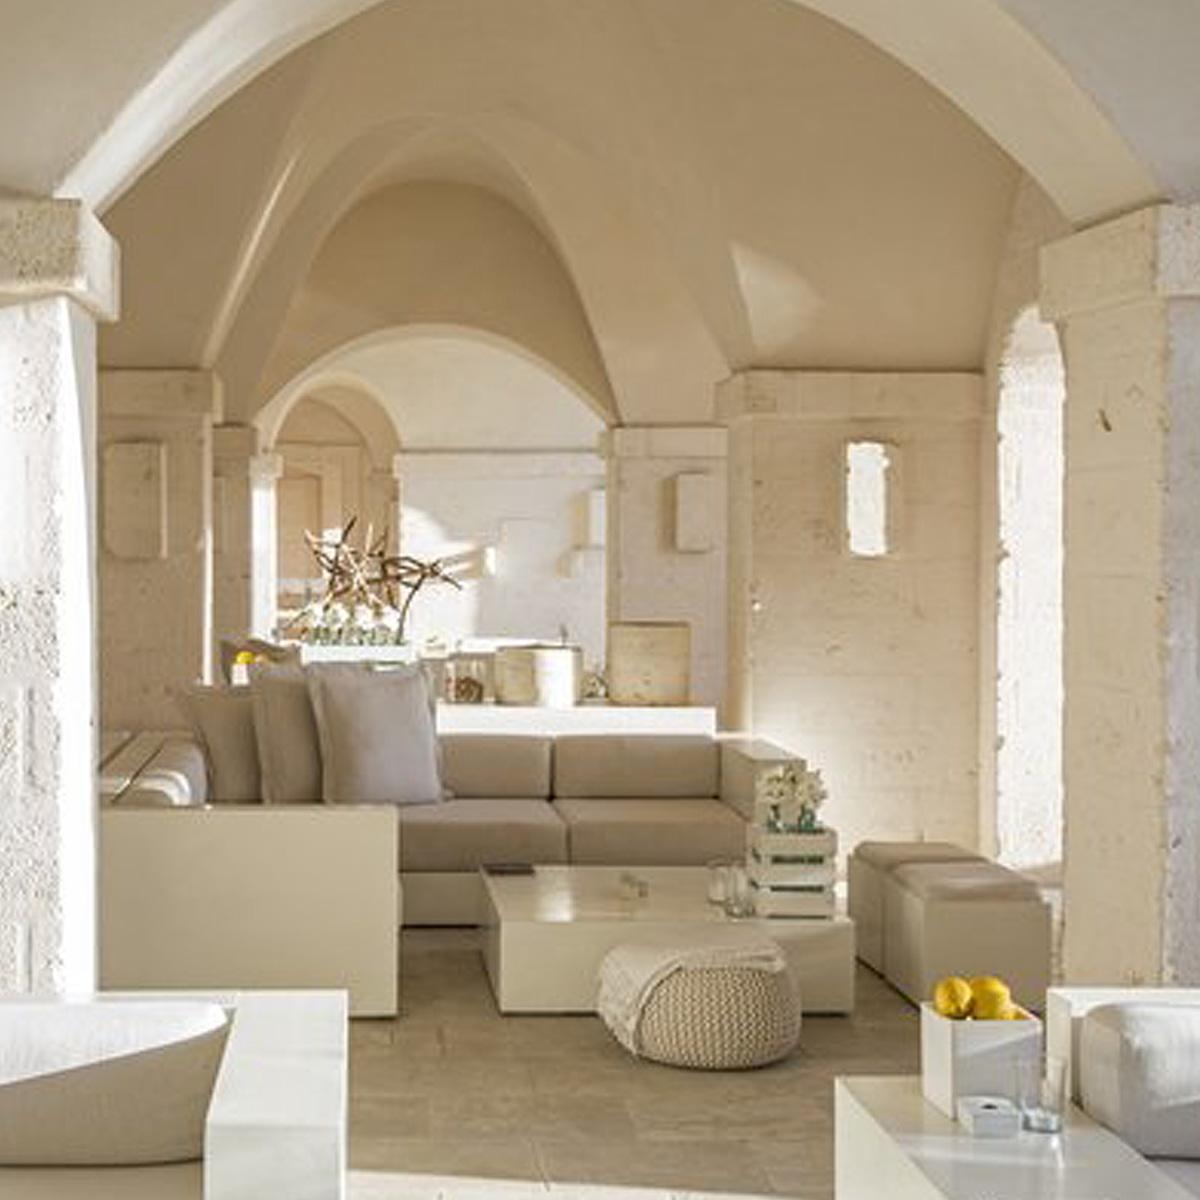 Borgo Egnazia (9)